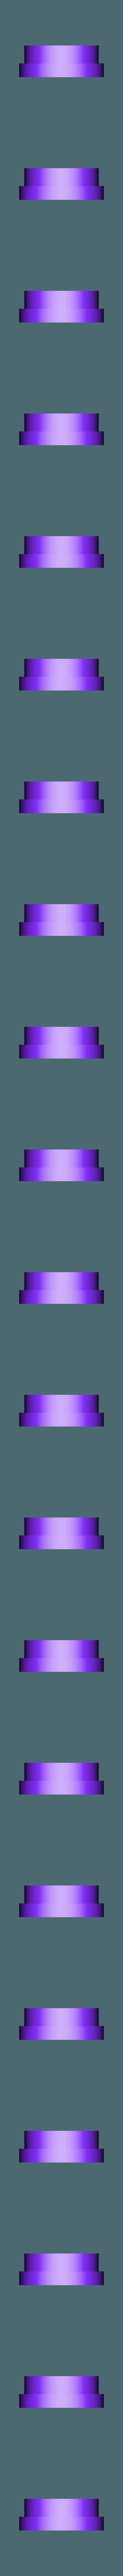 Qiilu_Collar.stl Download free STL file Qiilu laser Engraver On Off Button • 3D print design, 3rdesignworks